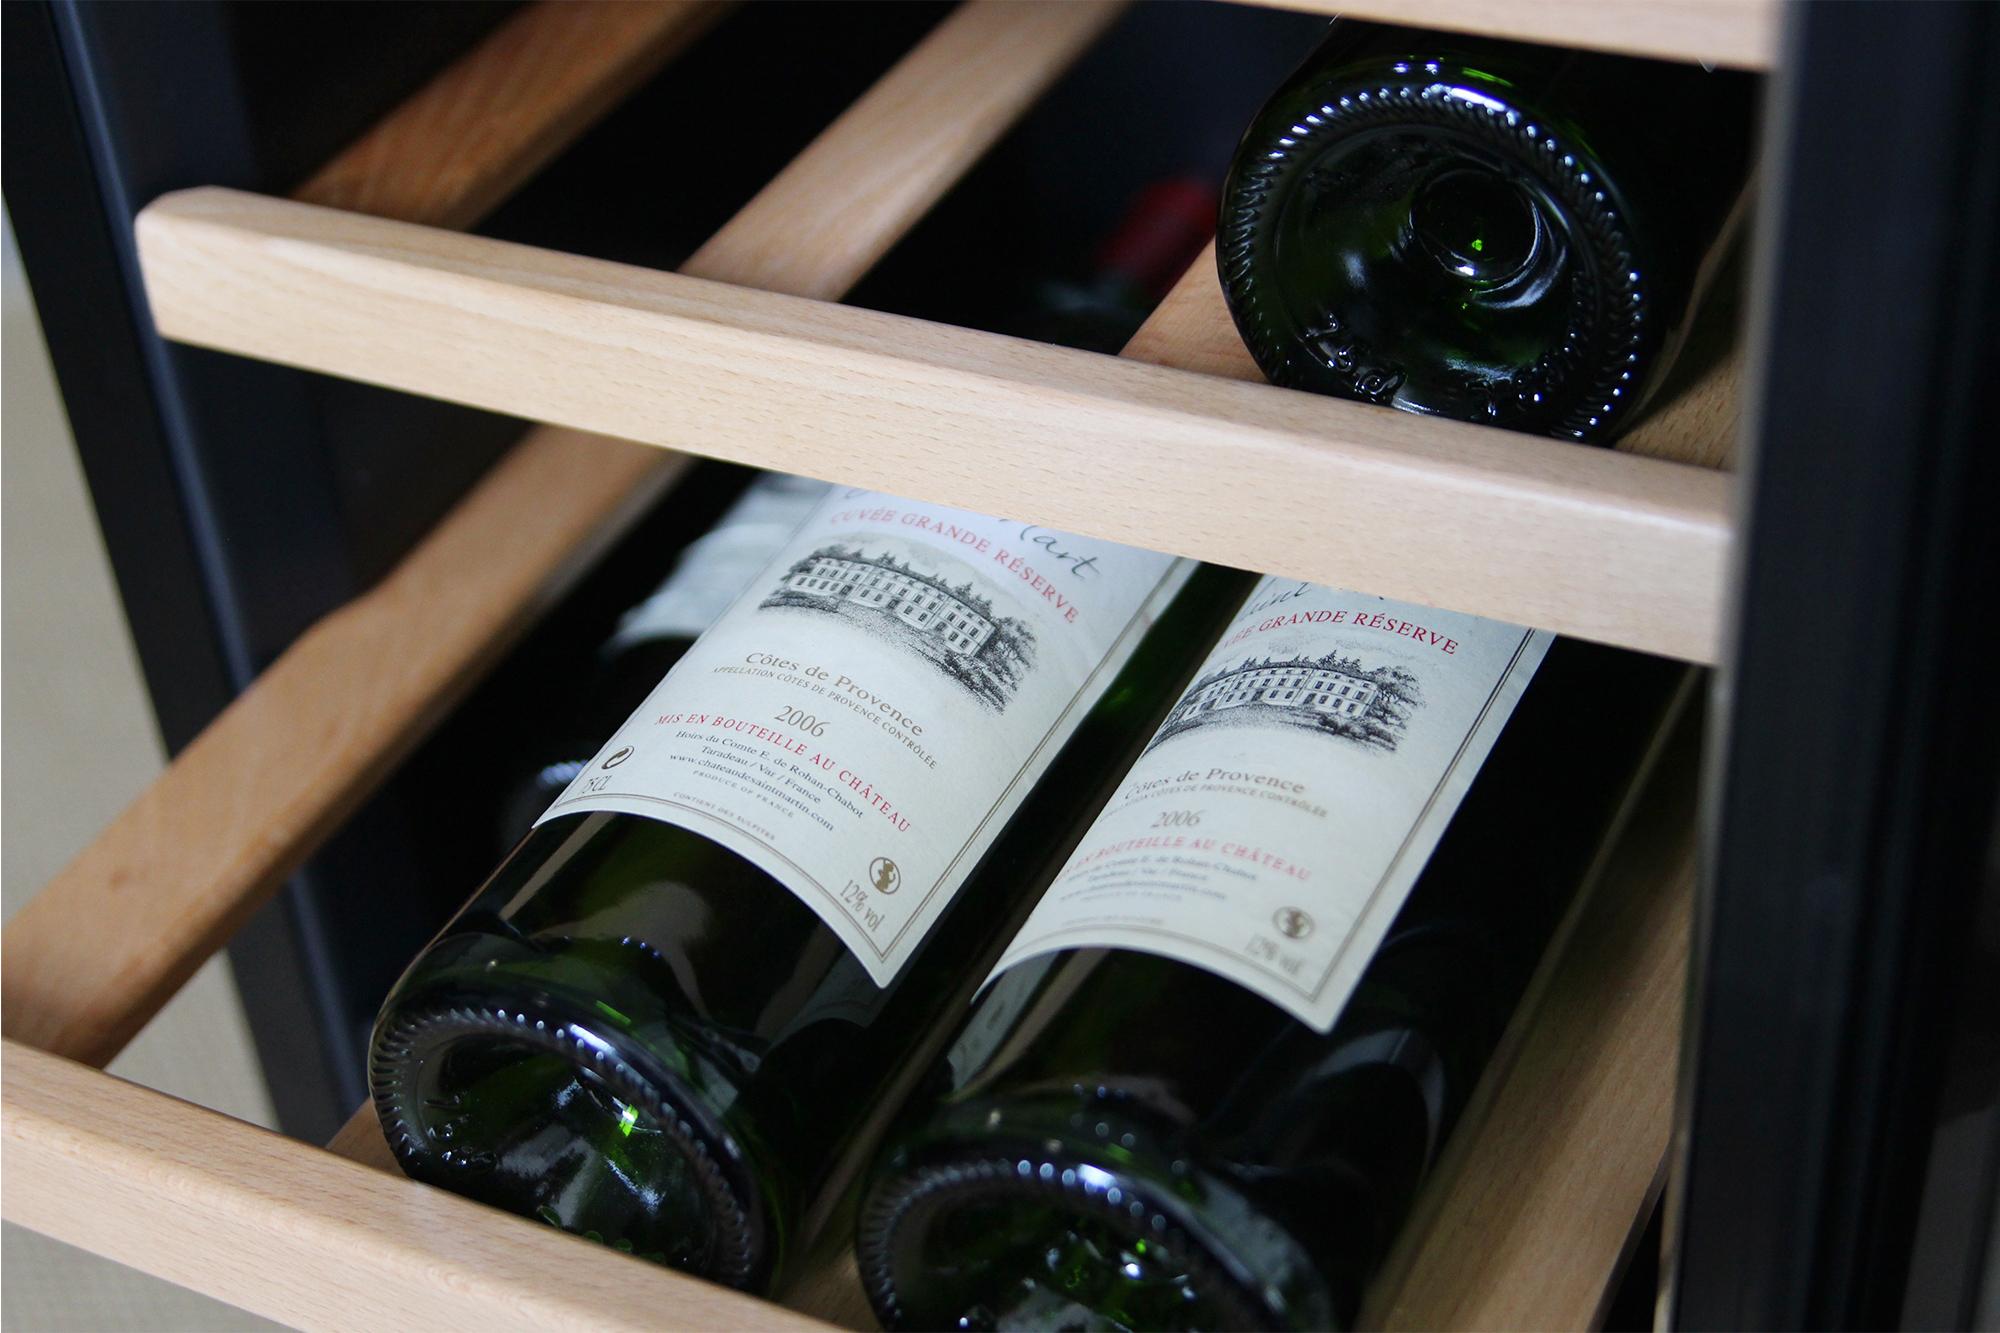 Fristående vinkyl - 24 flaskor - detalj